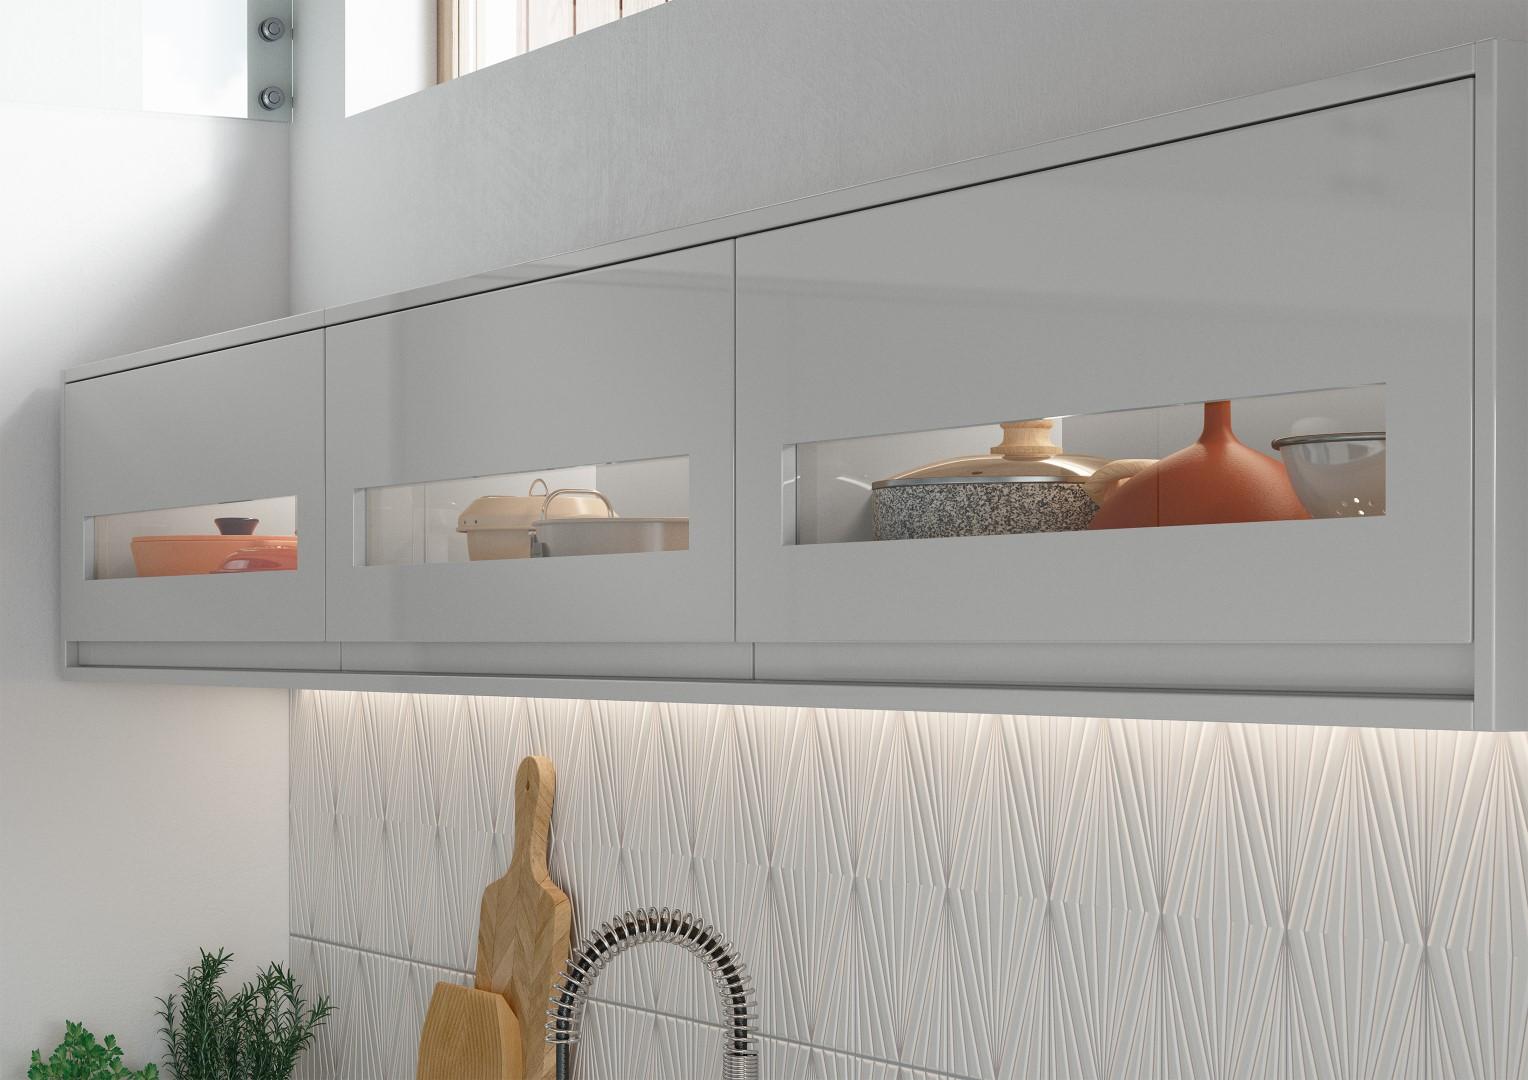 Strada Gloss Light Grey - Kitchen Design - Alan Kelly Kitchens - Waterford - 2